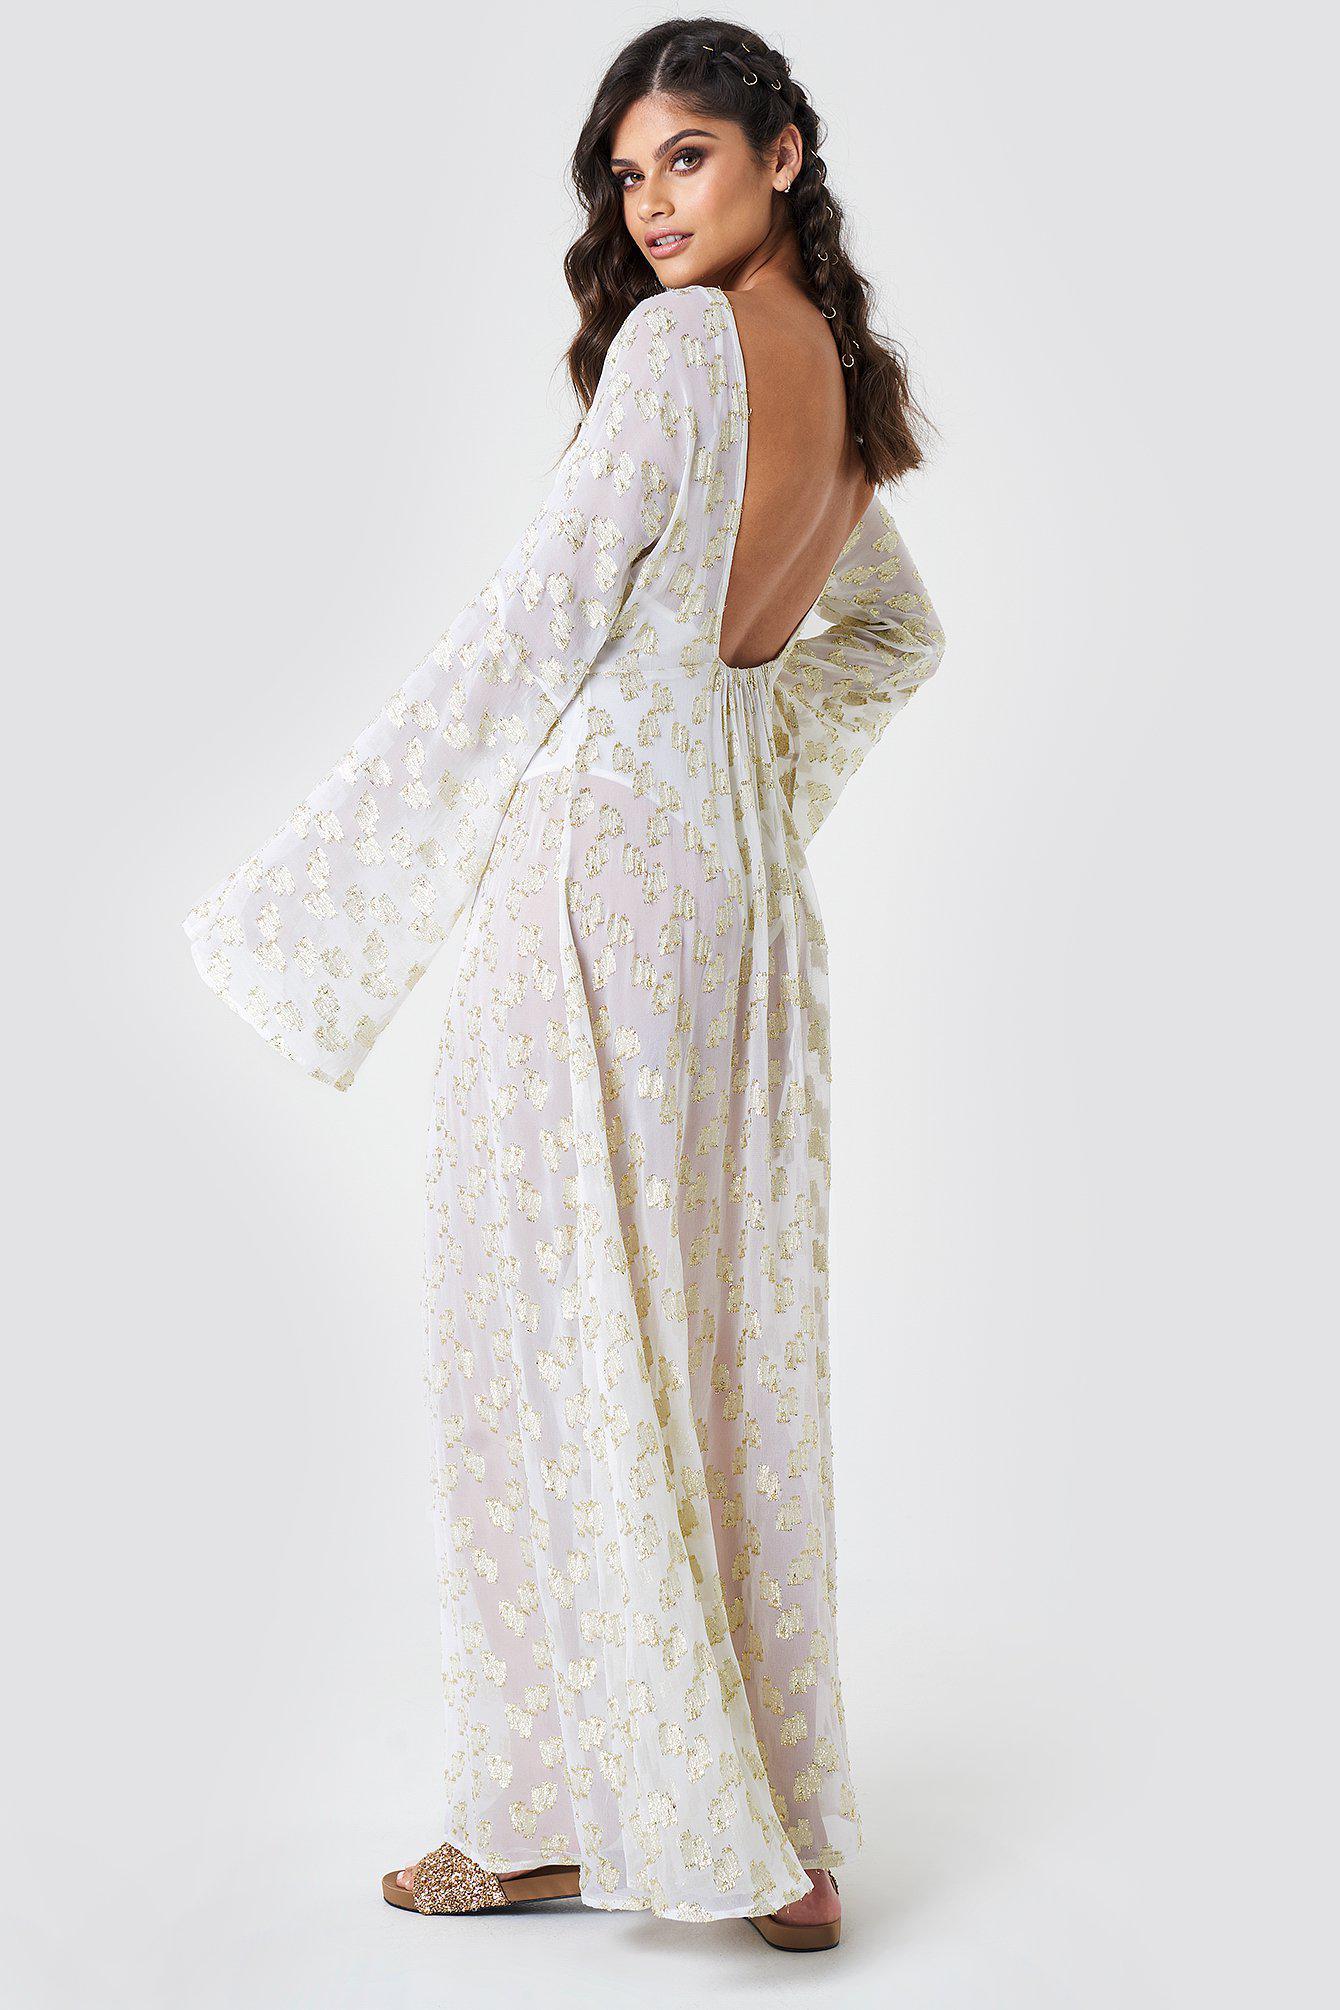 Lyst - Na-Kd Open Back Glitter Maxi Dress White in White 8a04080f0f